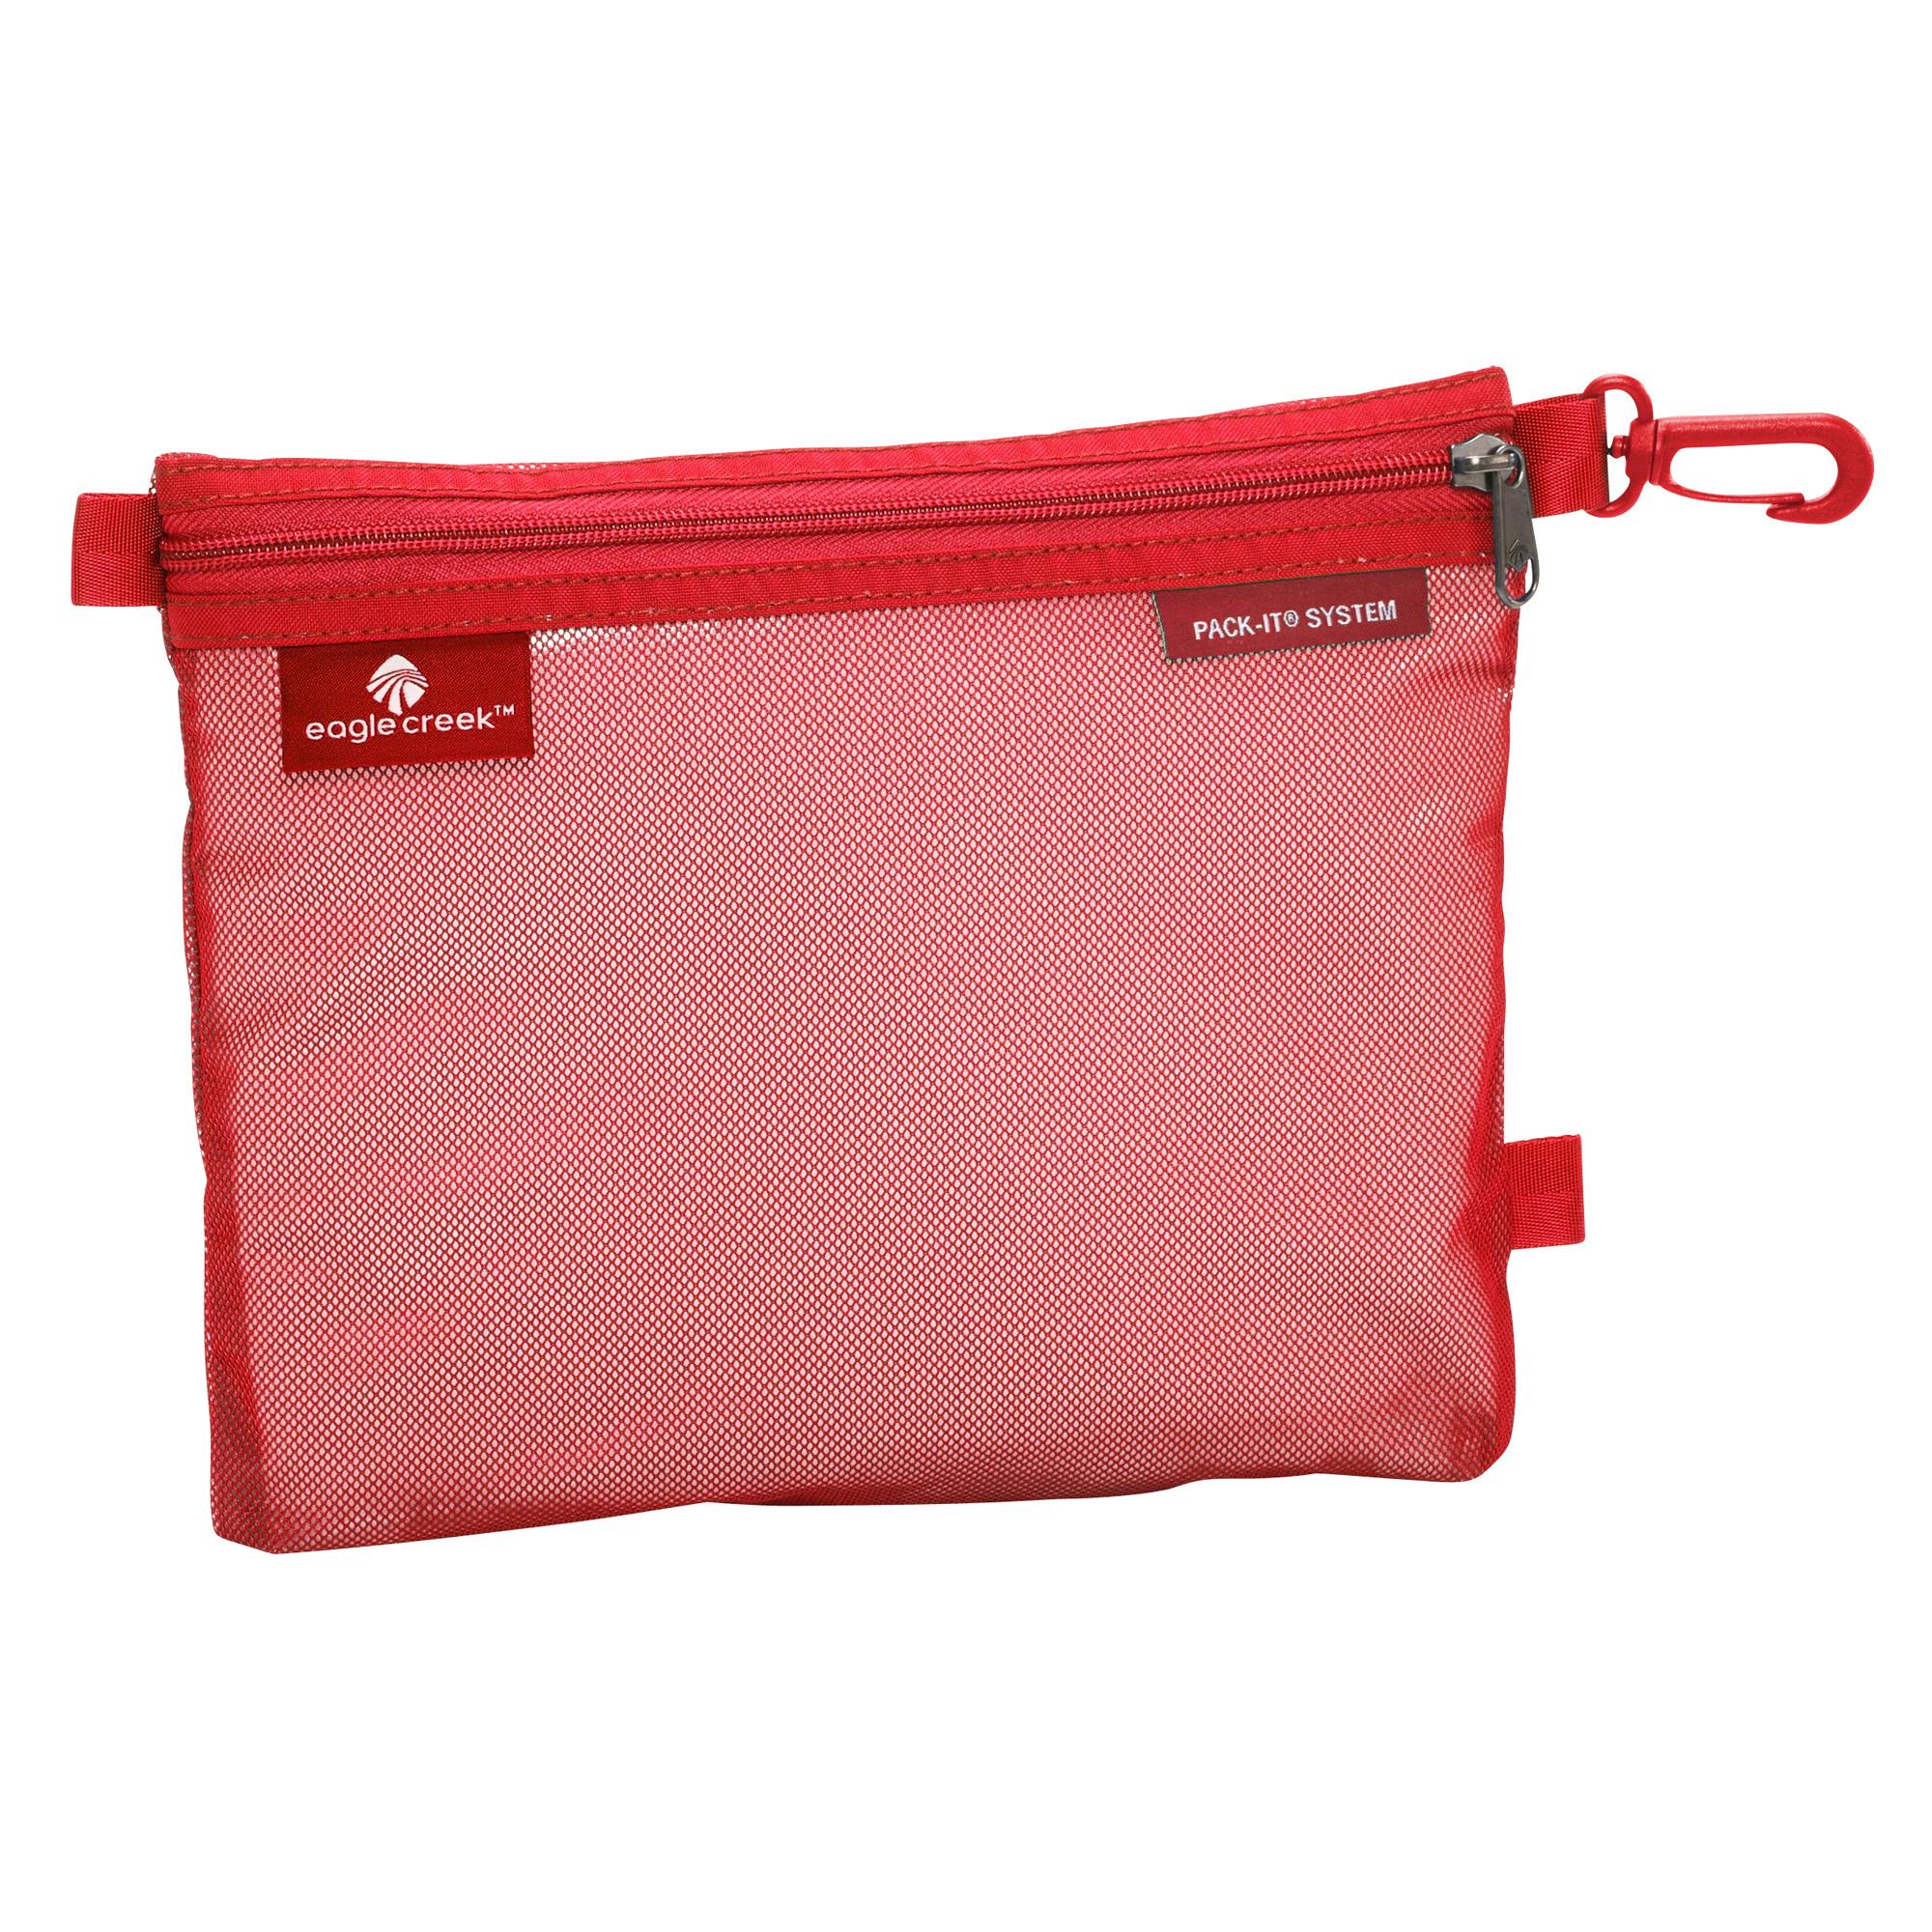 Pack-It Sac Medium - Red Fire